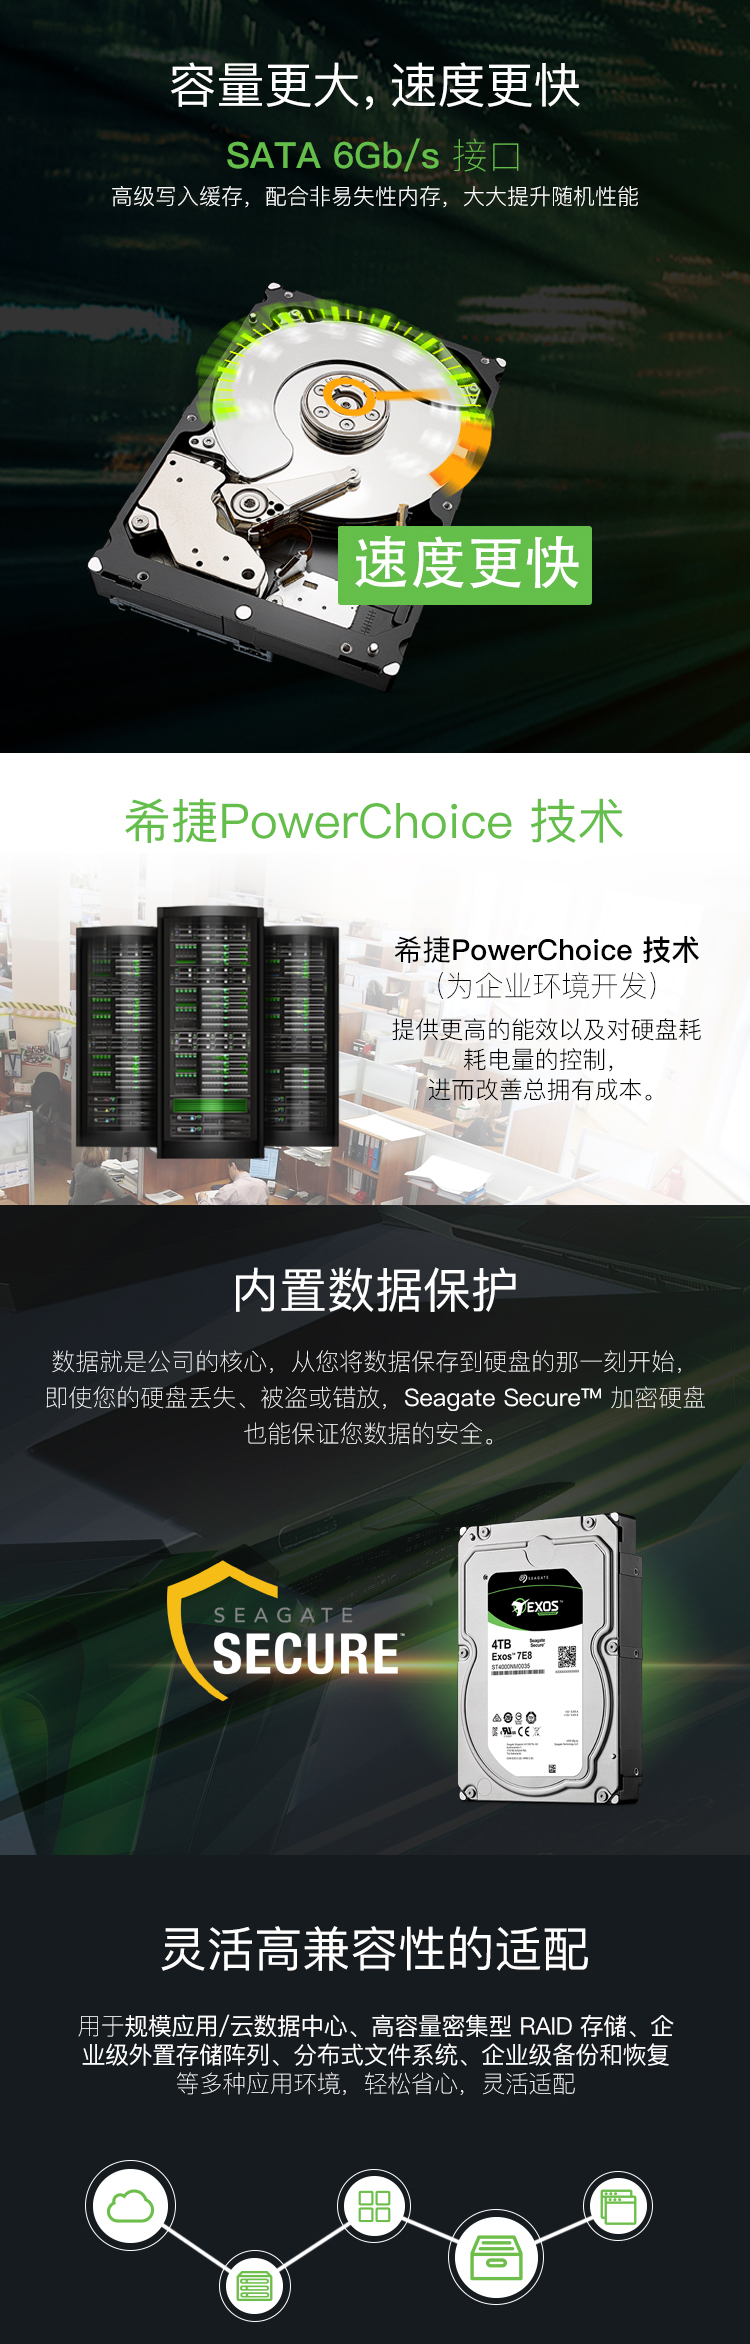 希捷 ST4000NM0035 系列 4TB 7200转 256MB 512n SATA 企业级硬盘